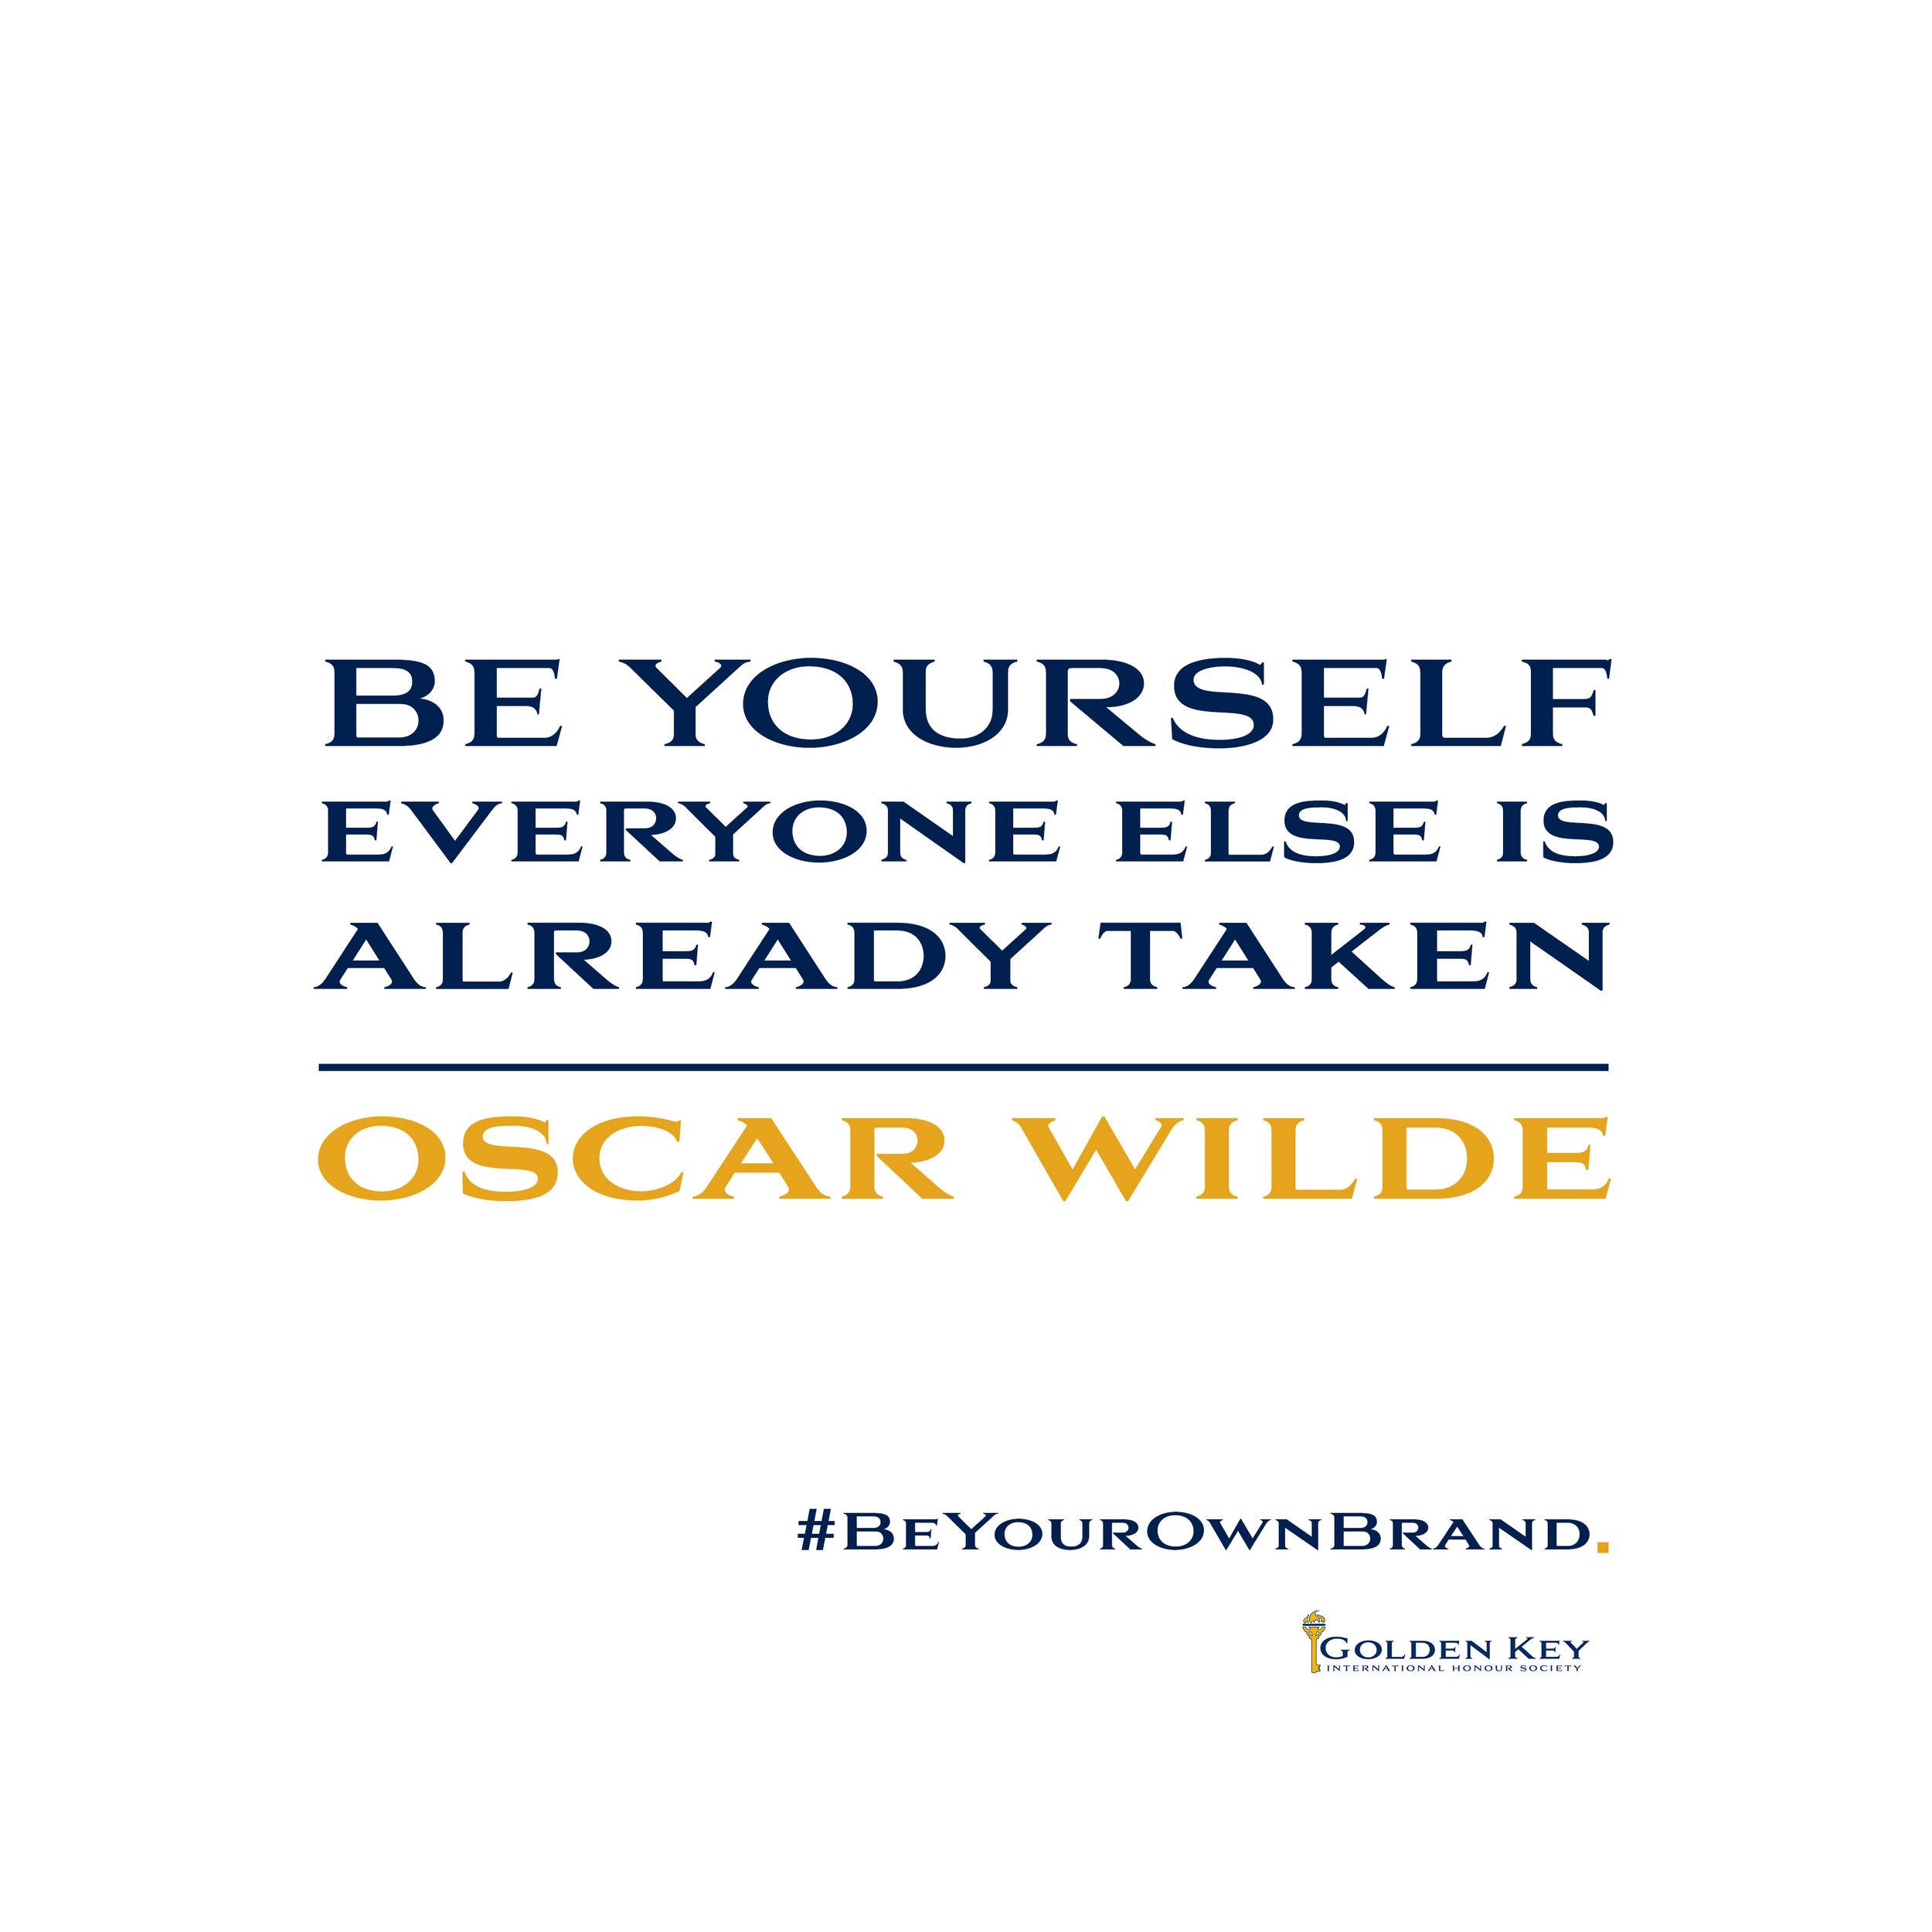 BeYourOwnBrand_OscarWilde.png